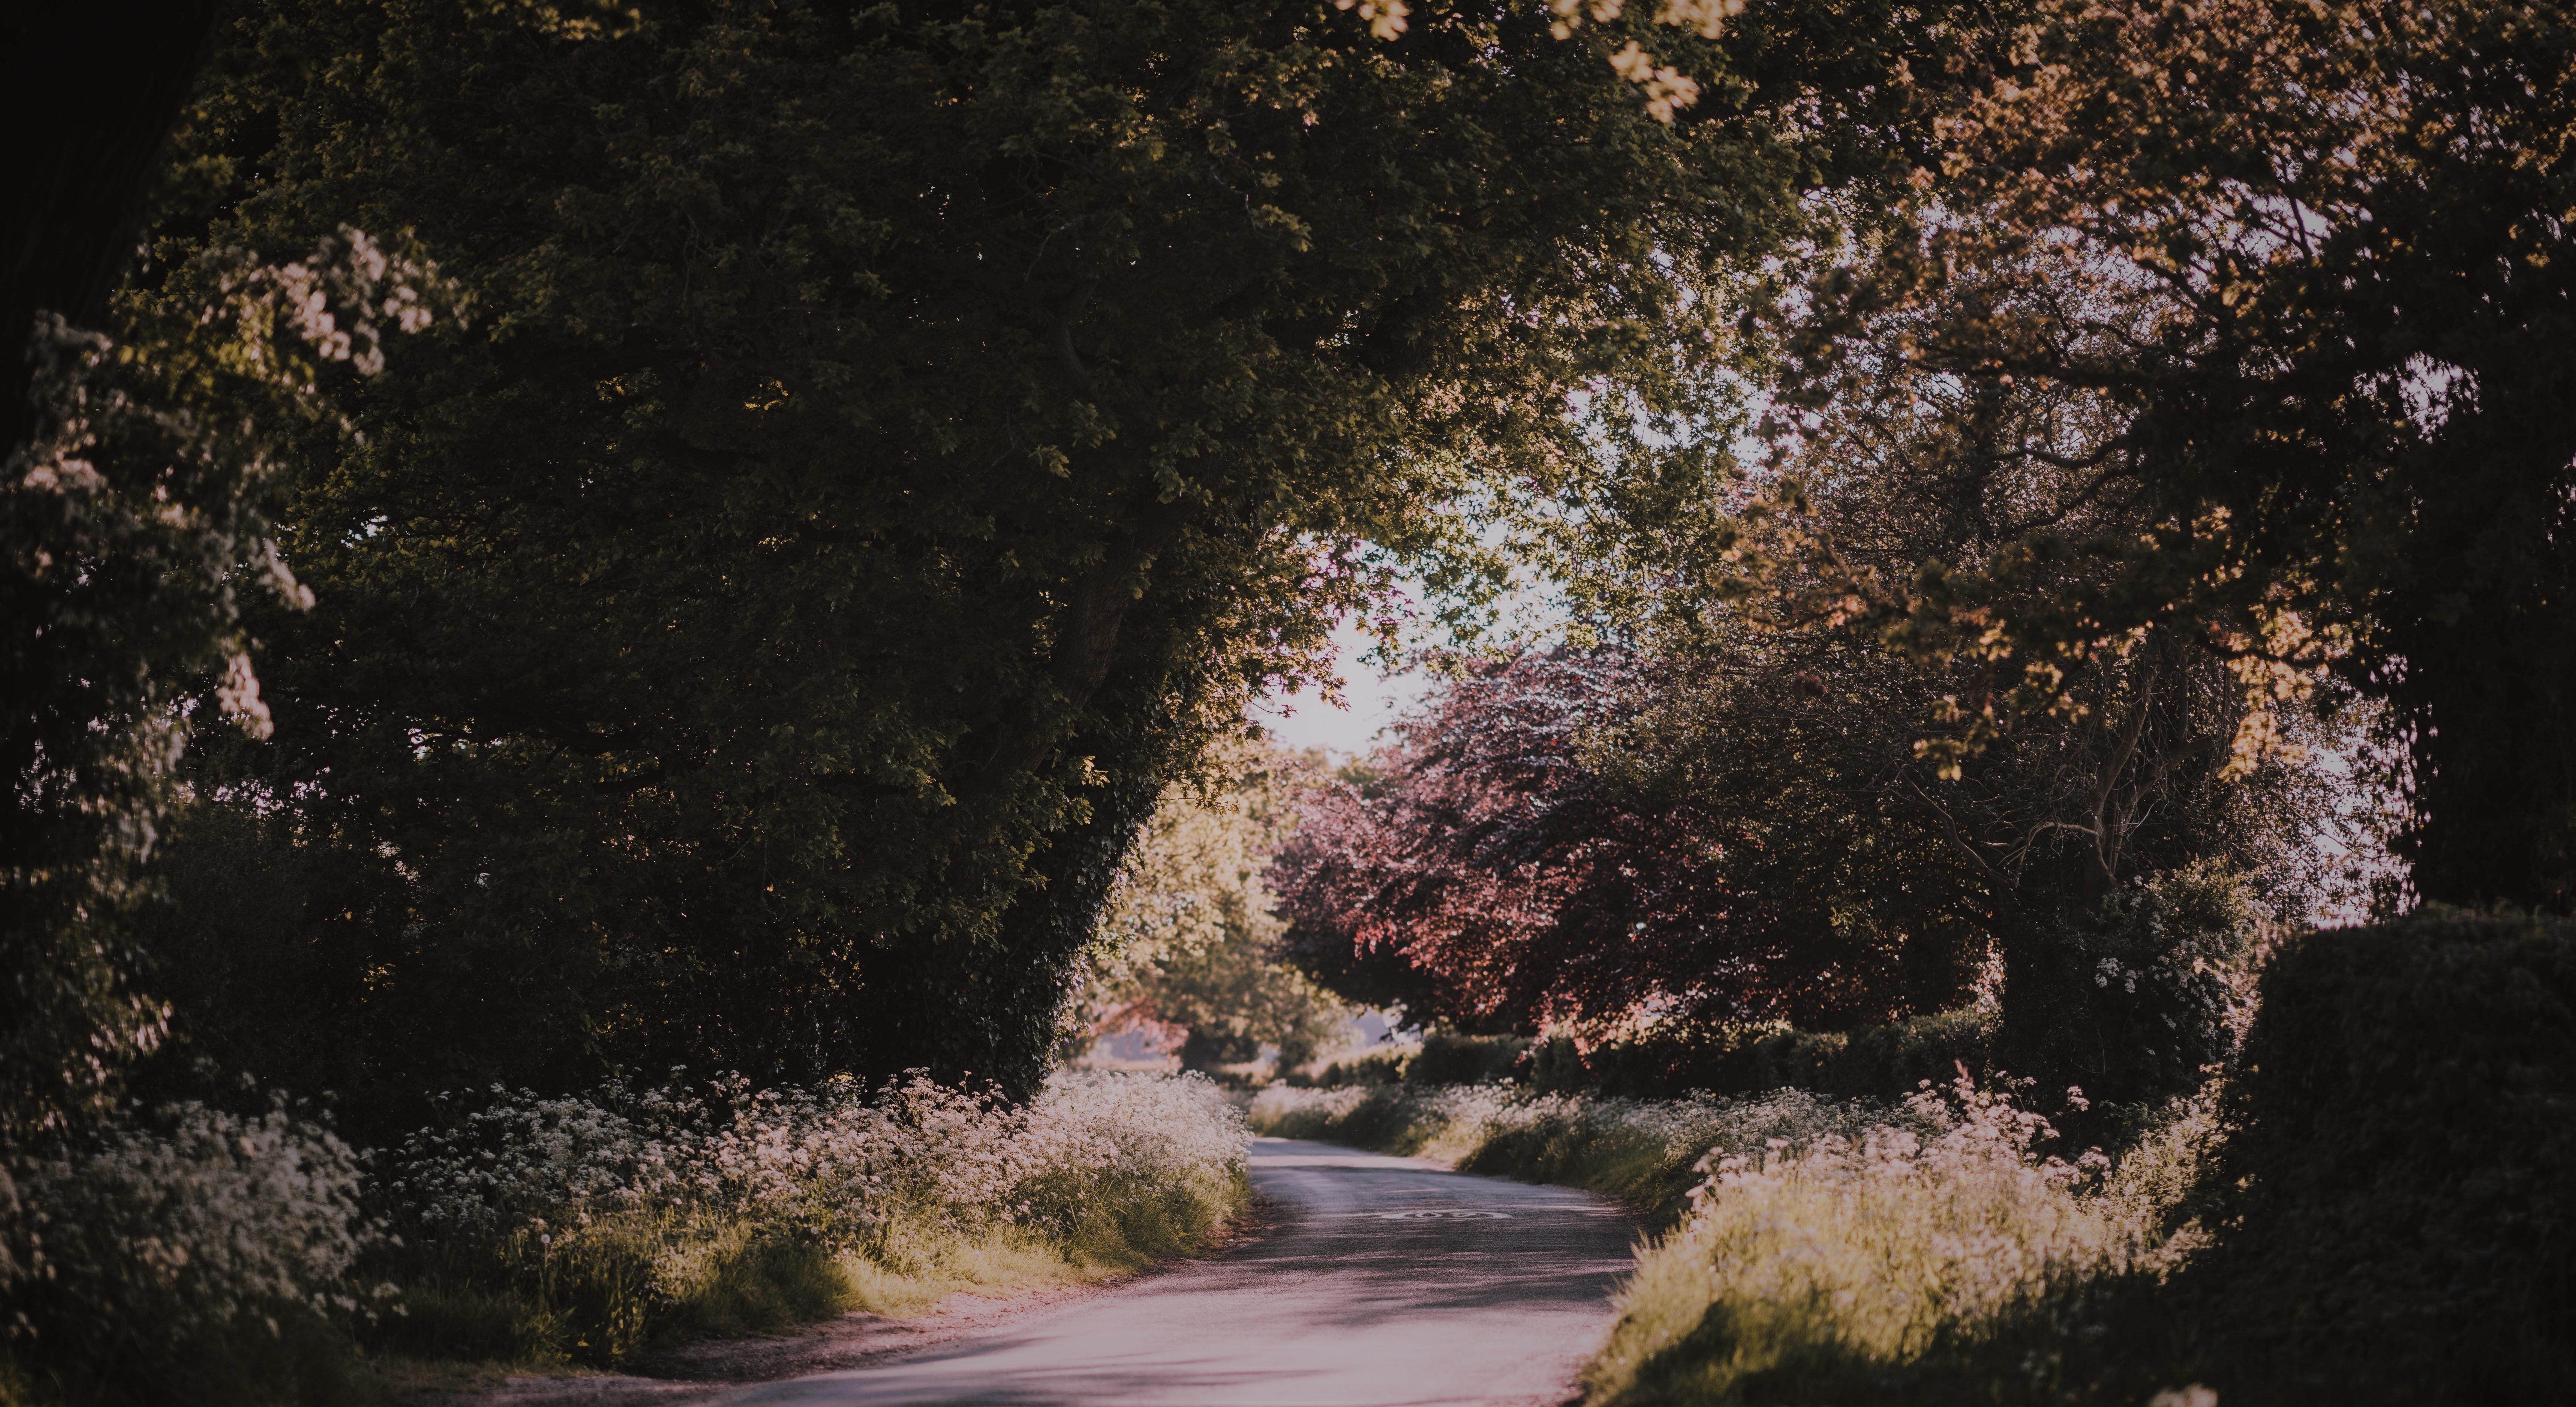 bend road